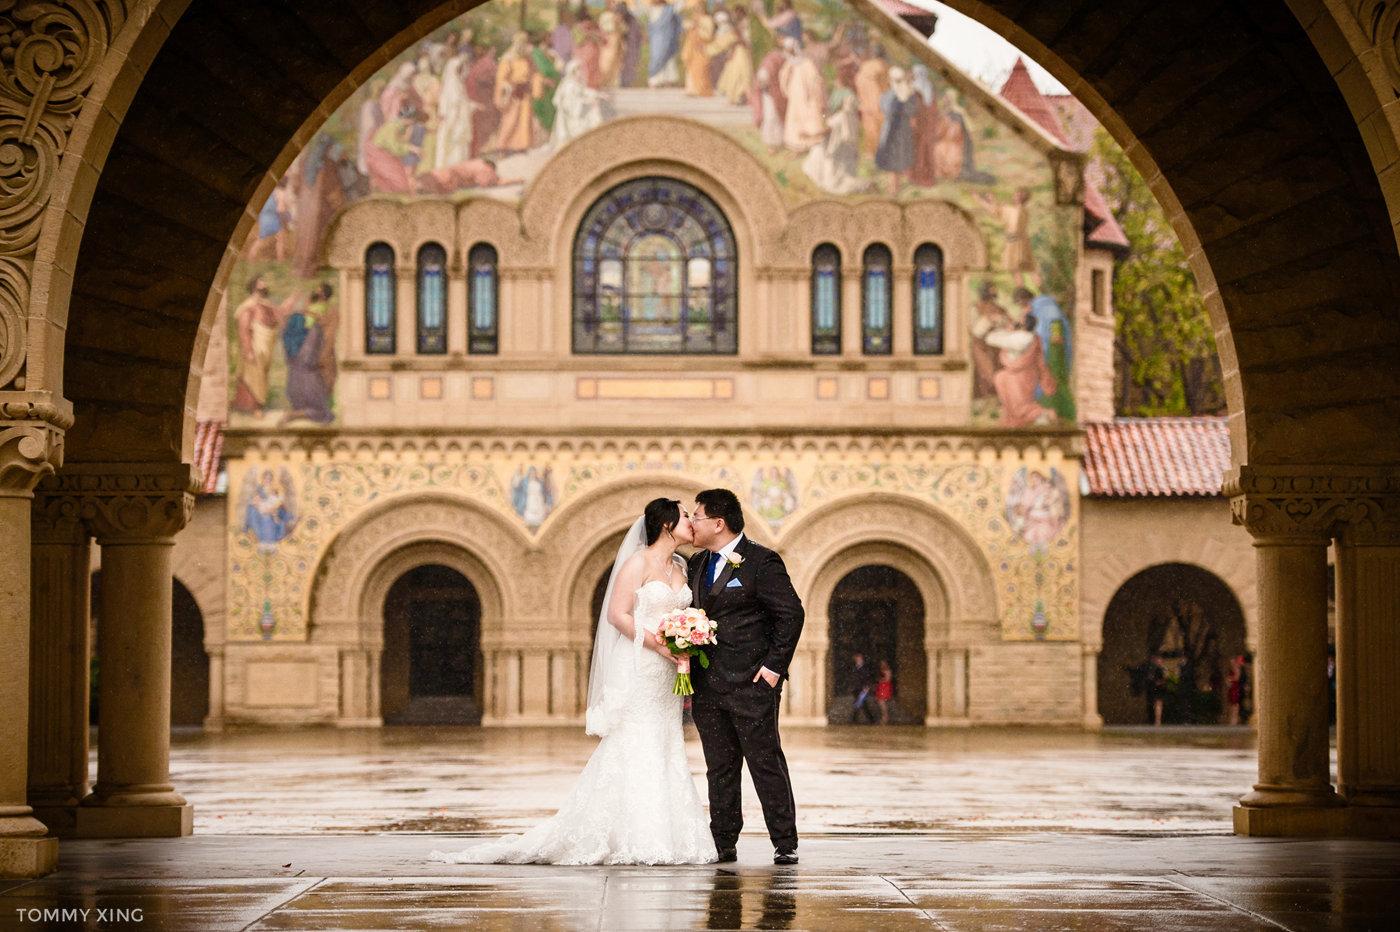 STANFORD MEMORIAL CHURCH WEDDING - Wenjie & Chengcheng - SAN FRANCISCO BAY AREA 斯坦福教堂婚礼跟拍 - 洛杉矶婚礼婚纱照摄影师 Tommy Xing Photography161.jpg